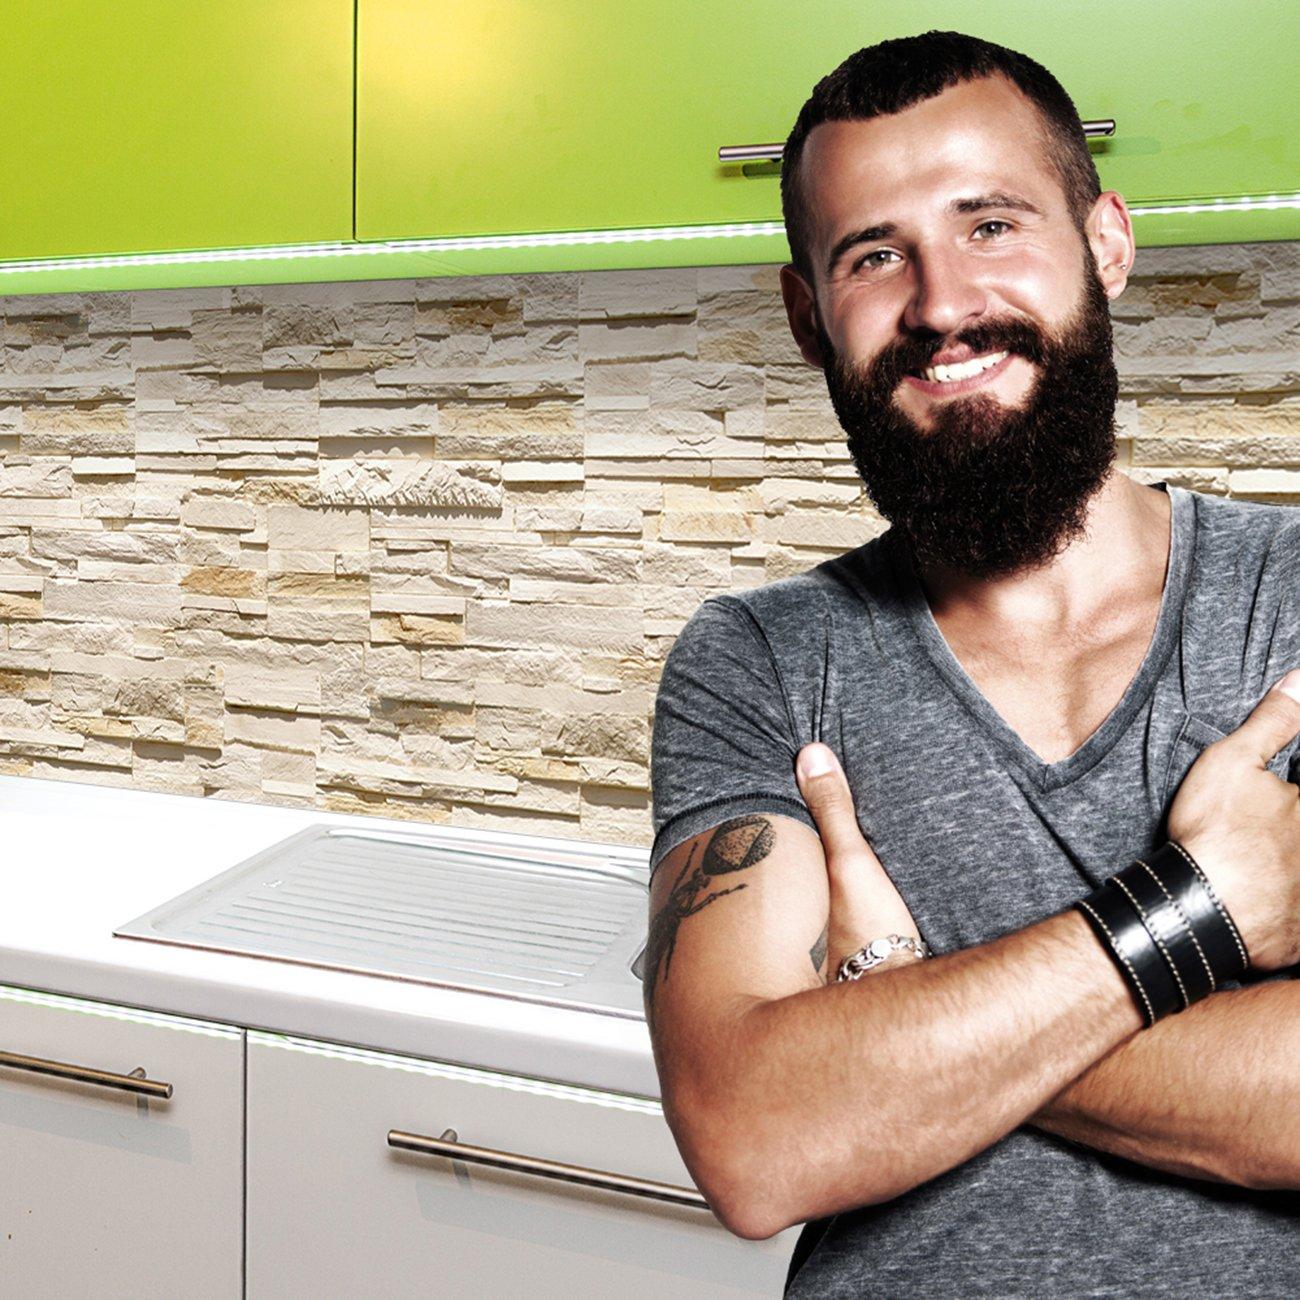 StickerProfis Küchenrückwand selbstklebend Pro STEINWAND Ashlar Mittelmeer 60 x 340cm DIY - Do It Yourself PVC Spritzschutz